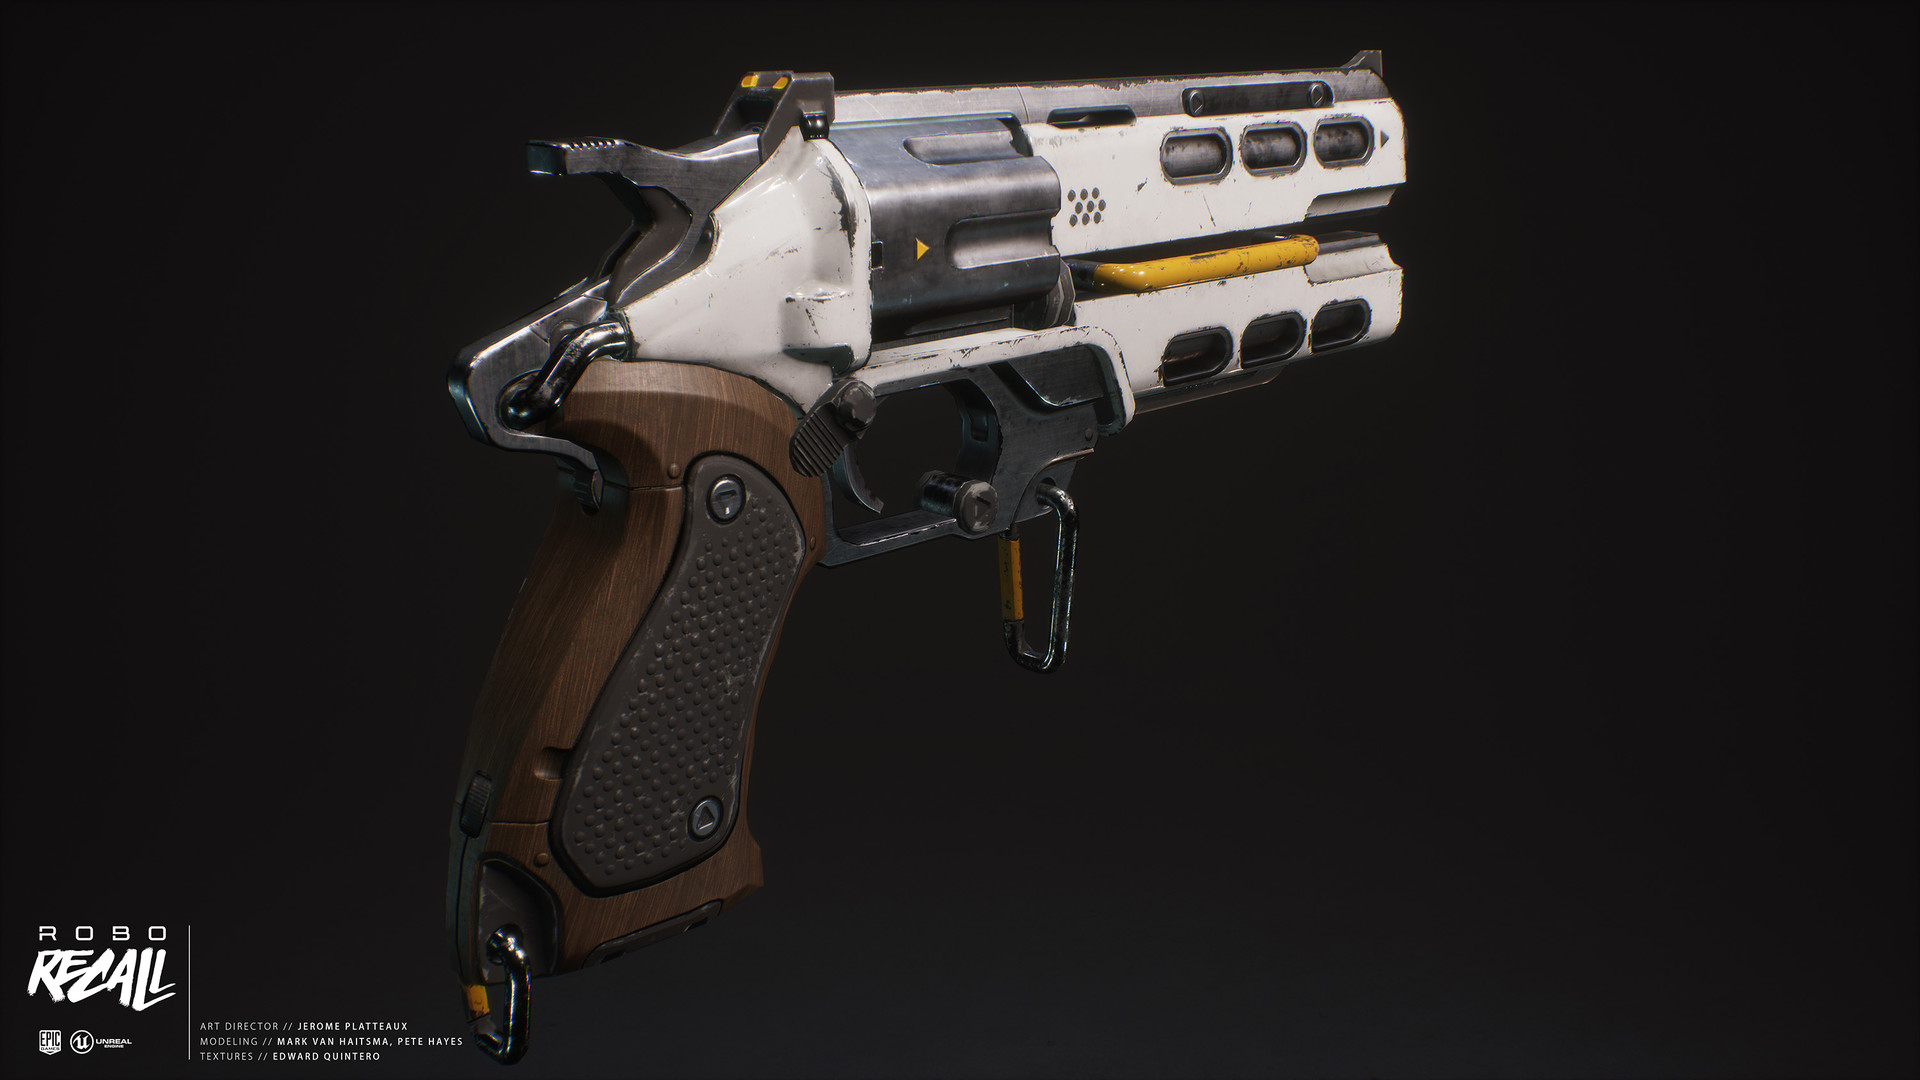 Mark van haitsma revolver 05